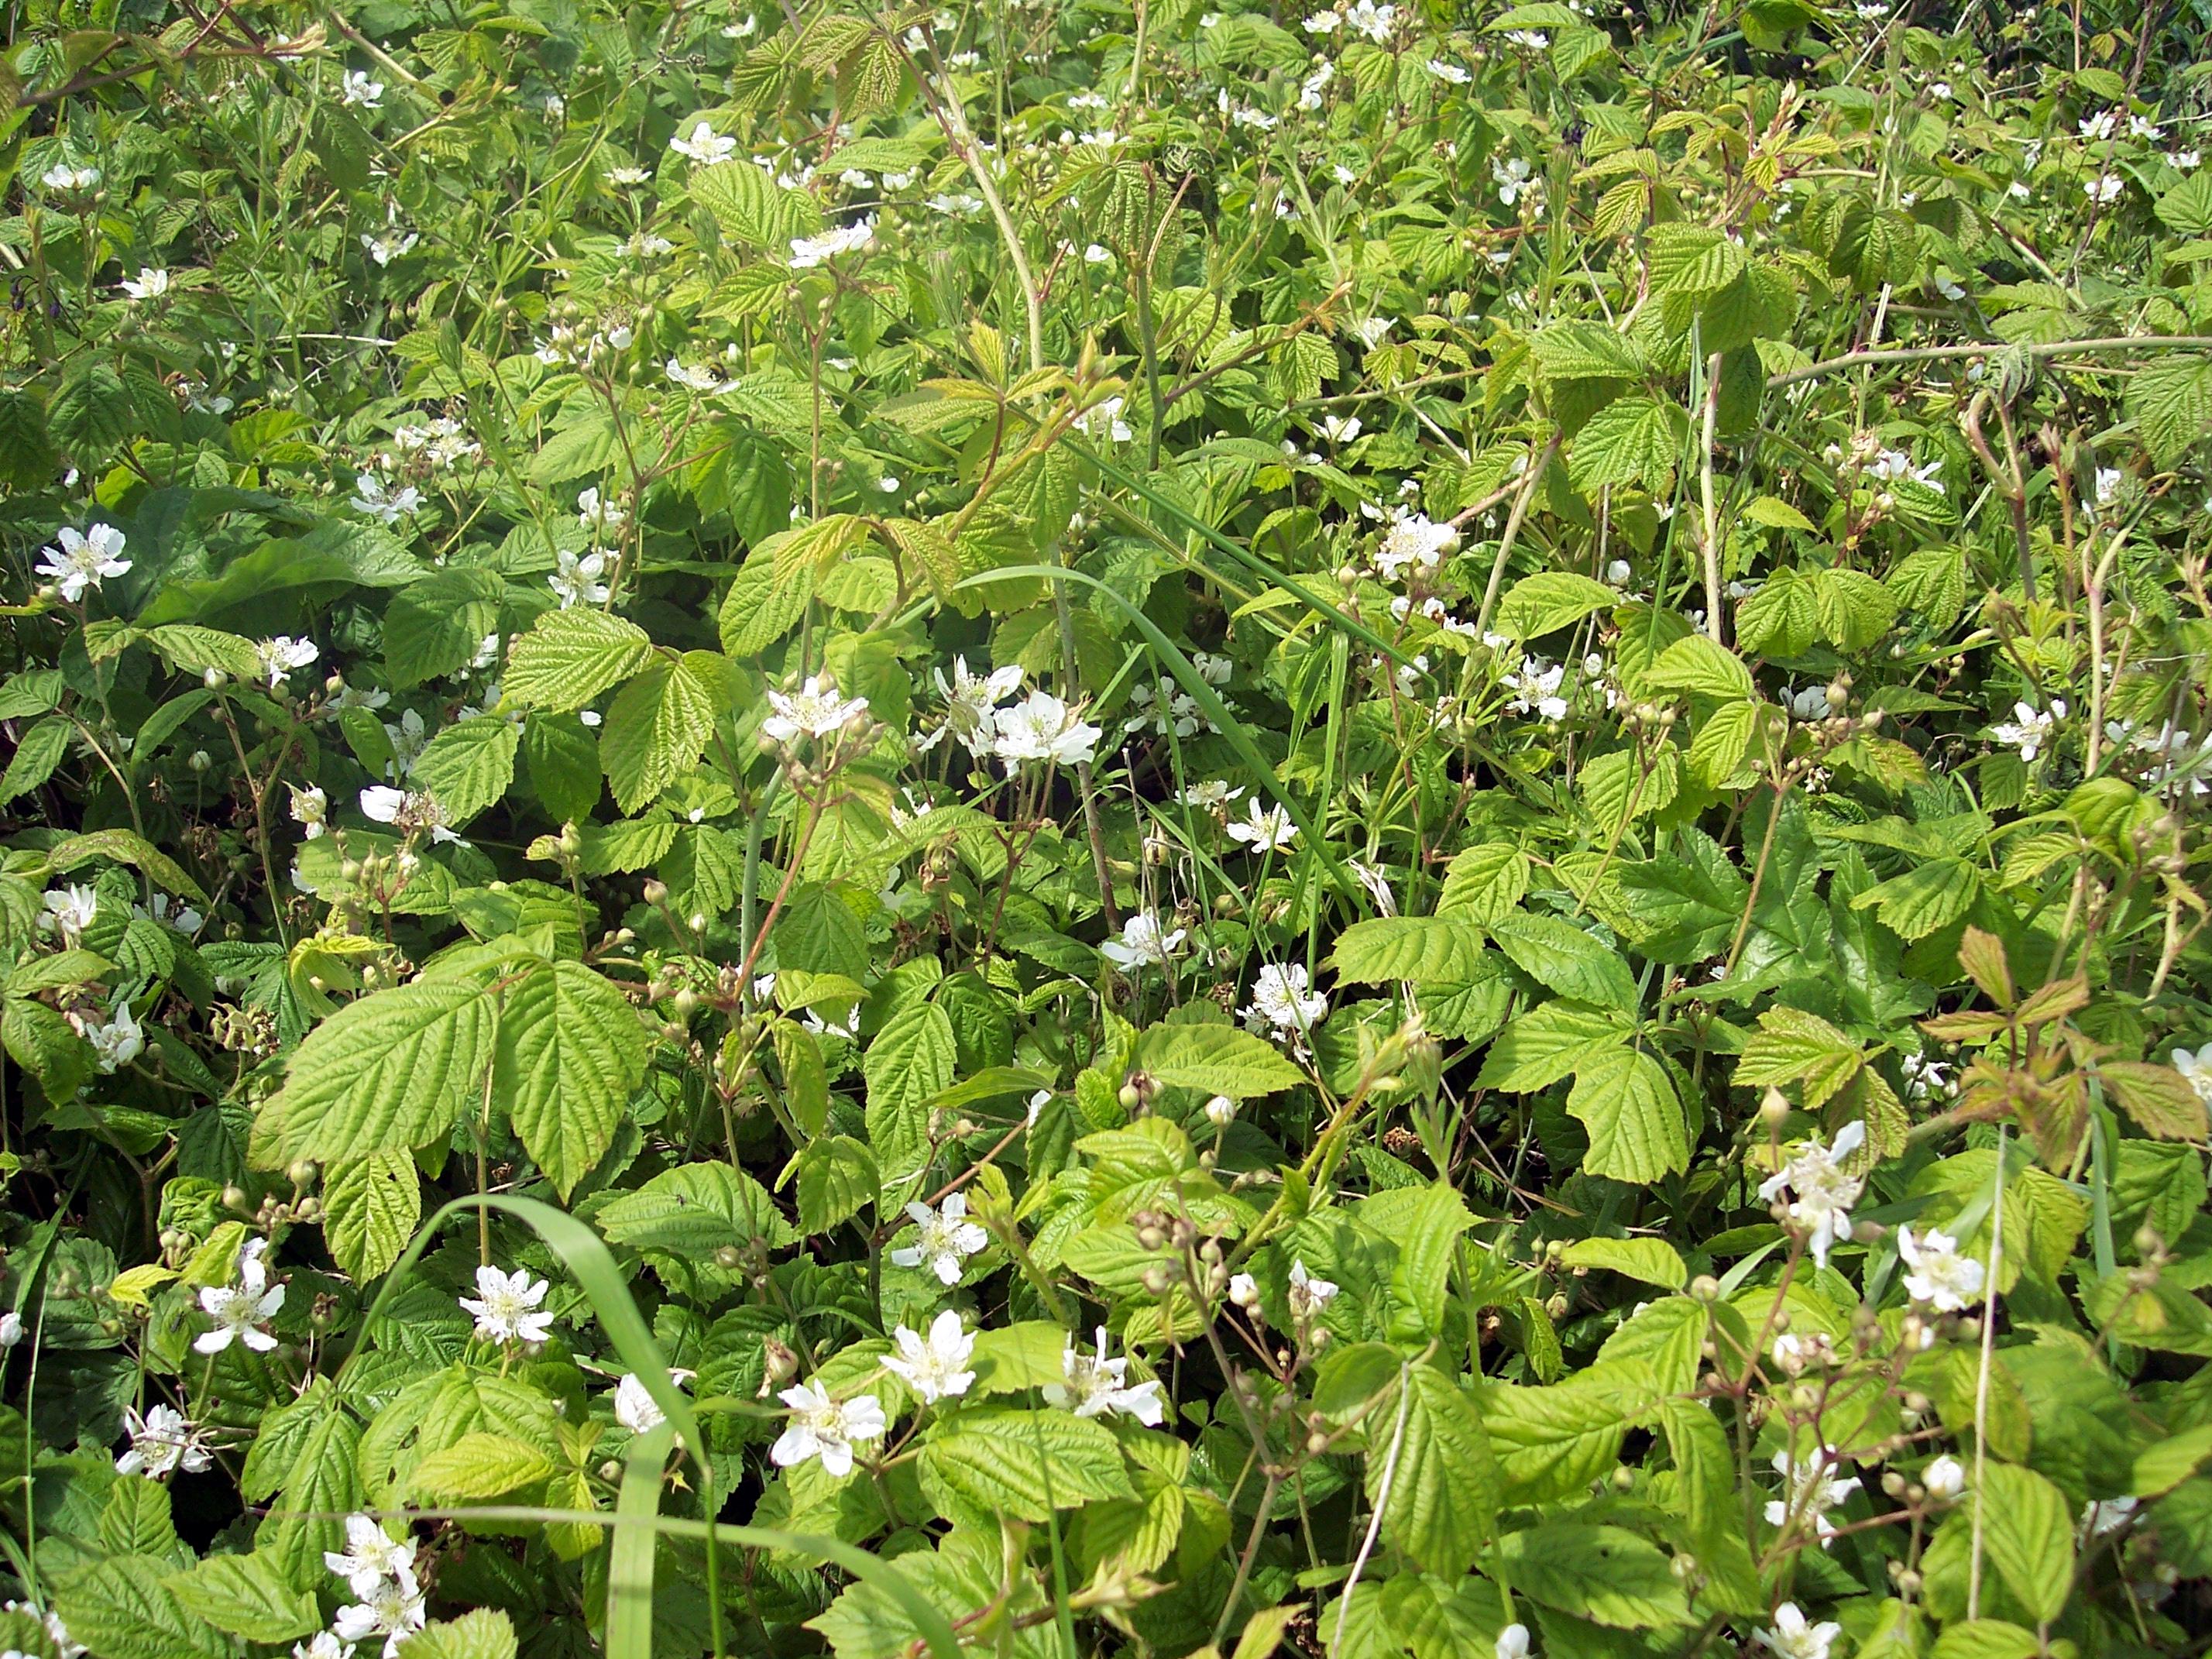 Bramble -Blackberry (Rubus fruticosus): NEN Gallery